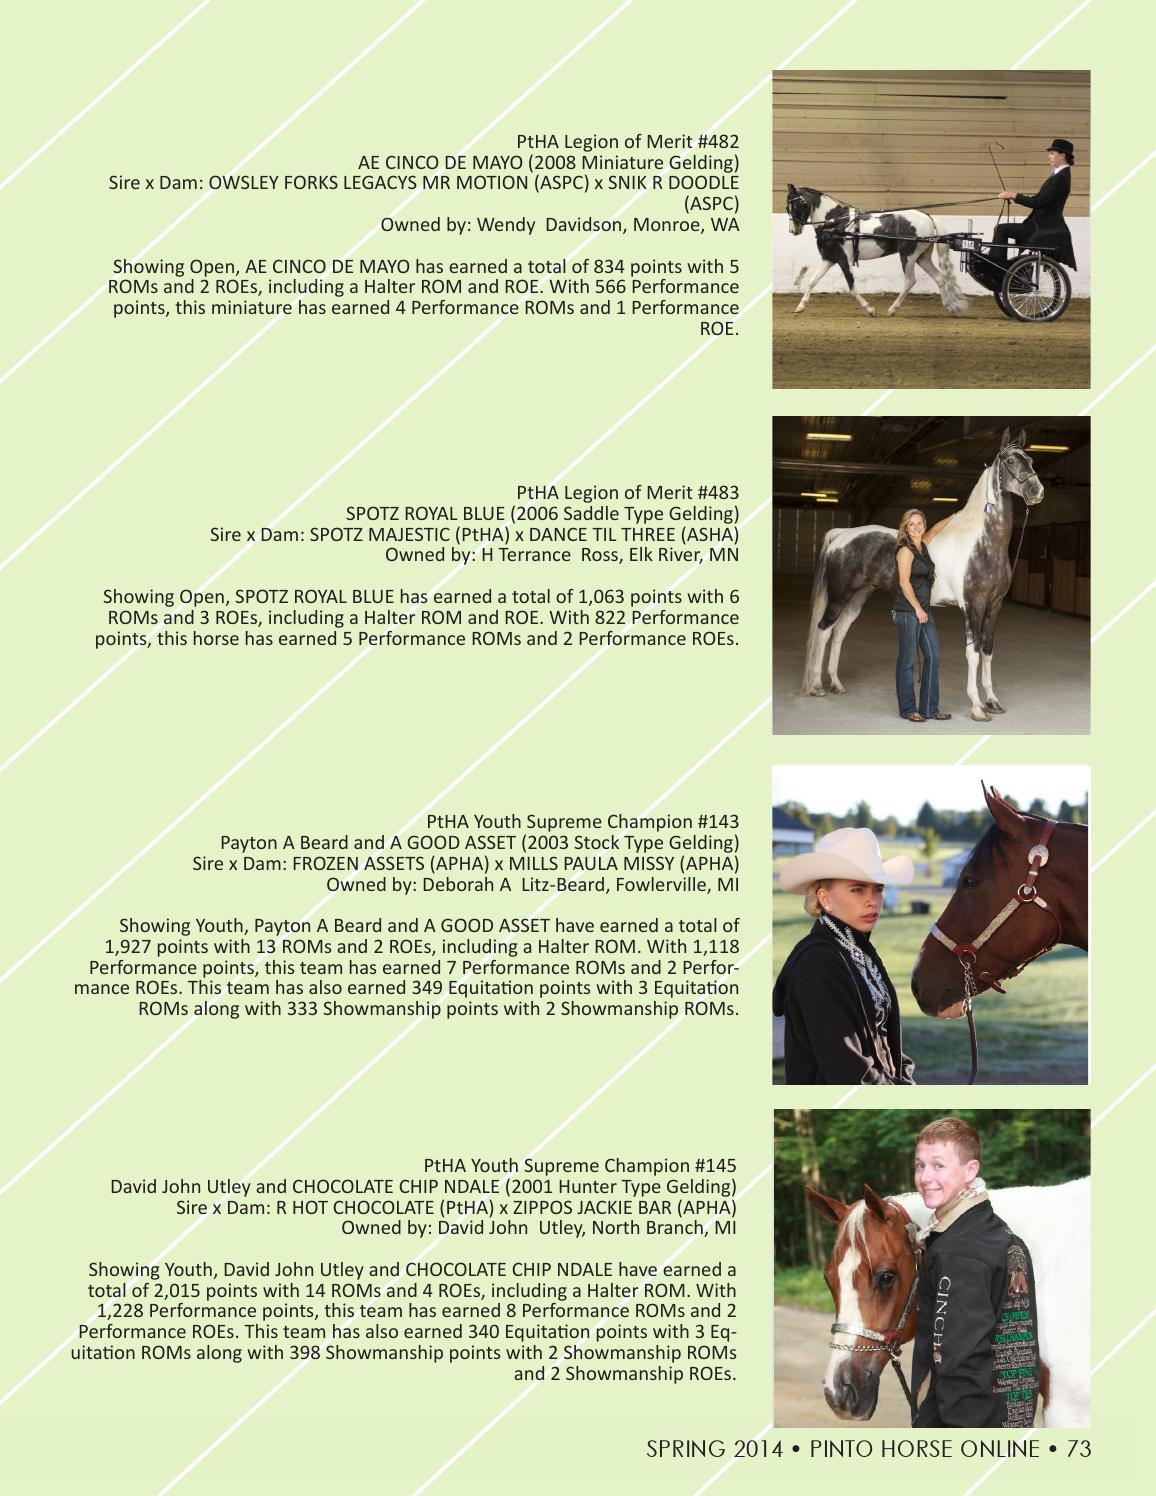 Pinto Horse Magazine - Spring 2014 by Pinto Horse